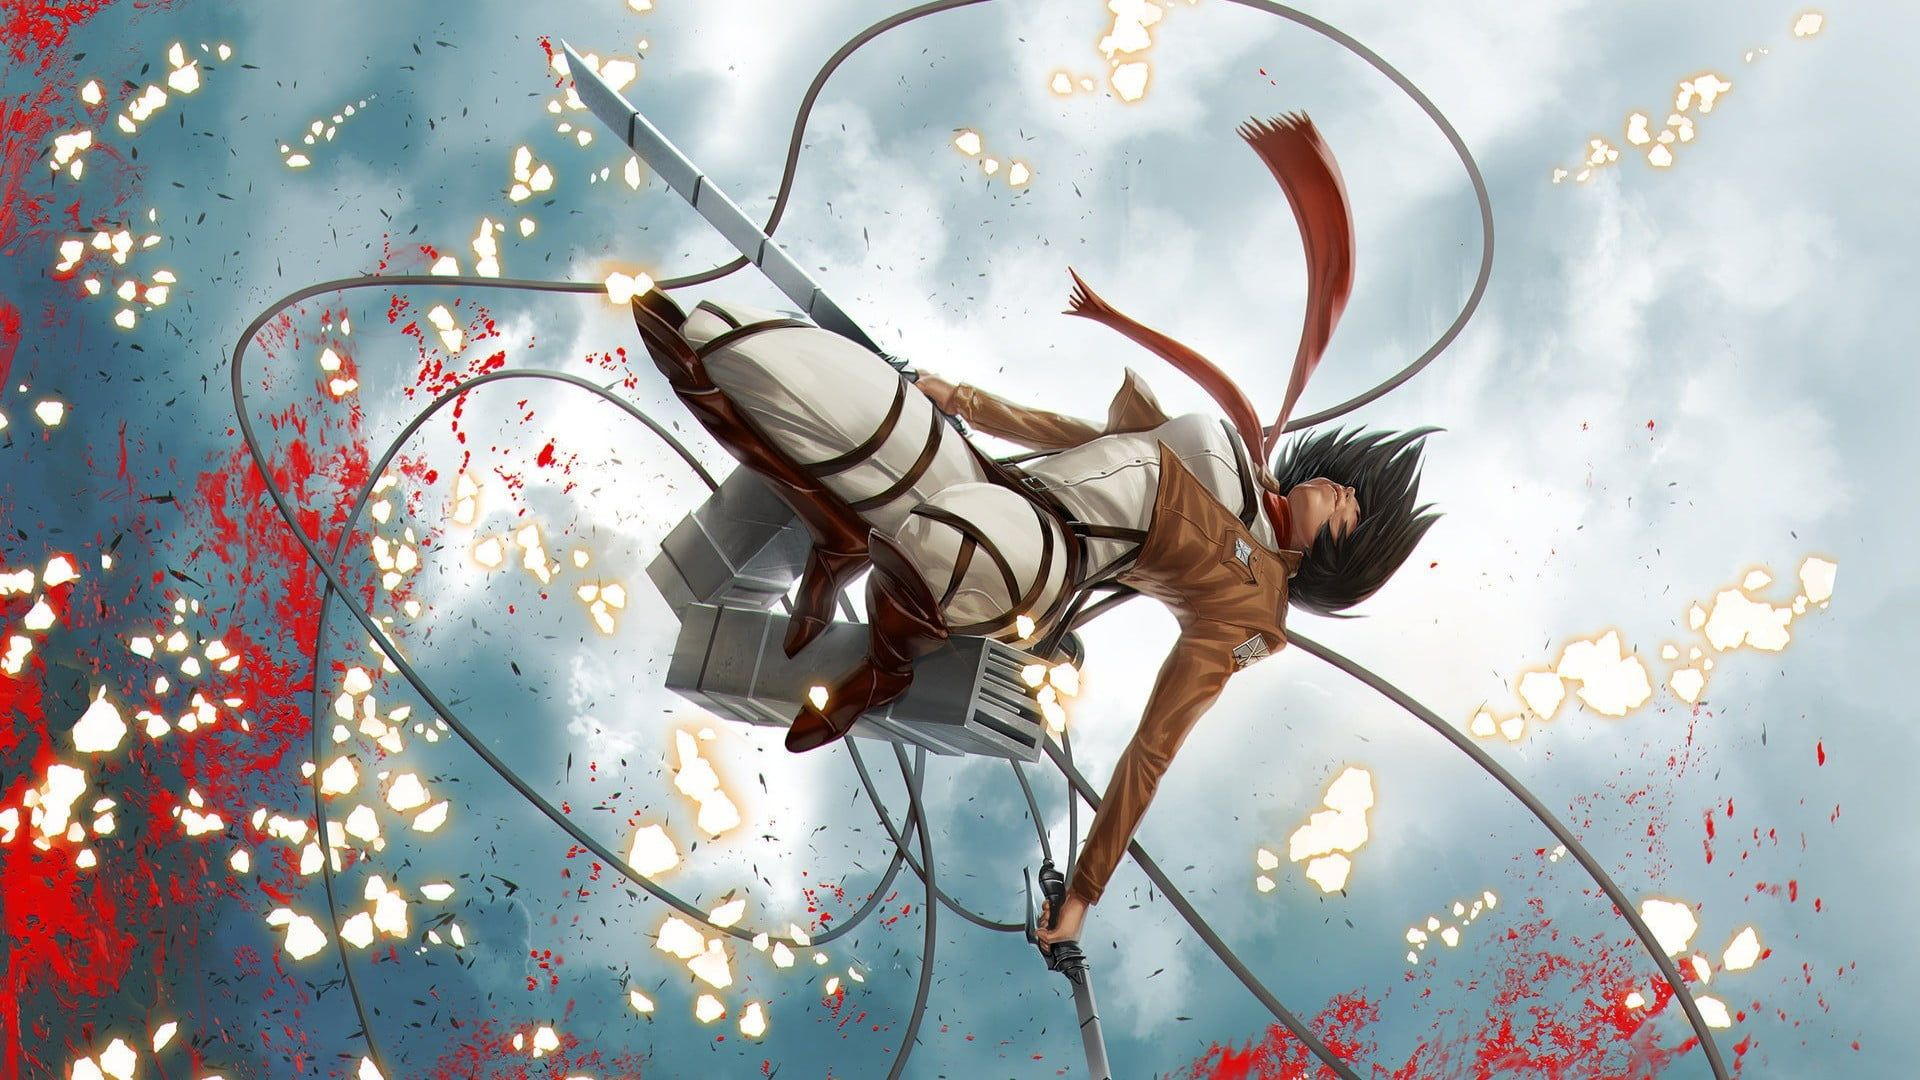 Attack On Titan Mikasa Wallpaper Shingeki No Kyojin Mikasa Ackerman Anime 1080p Wallpaper Hdwallpaper Attack On Titan Attack On Titan Anime Anime Wallpaper